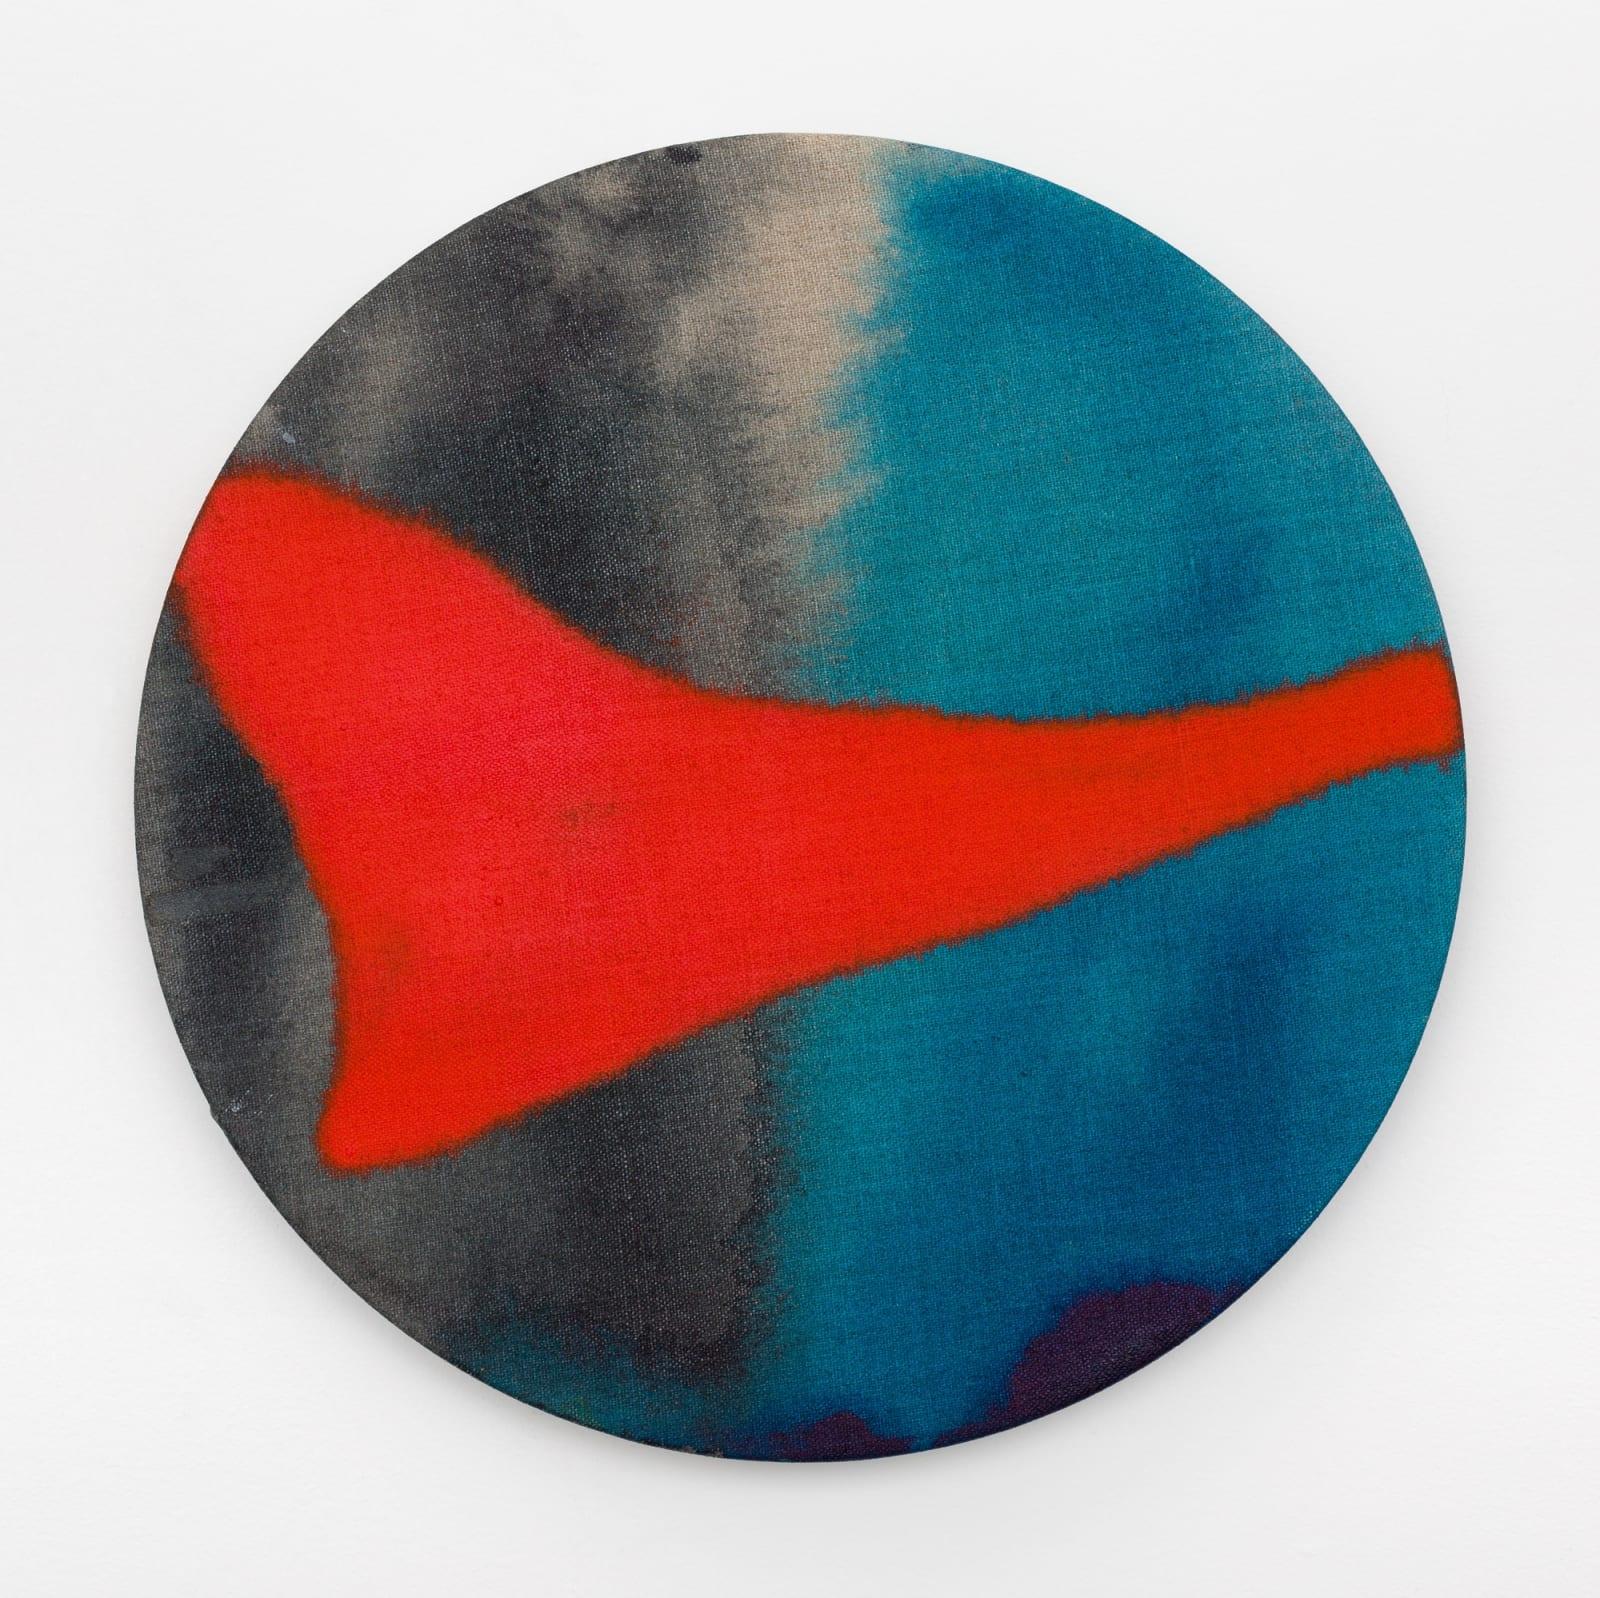 Pamela Jorden Interval (red), 2020